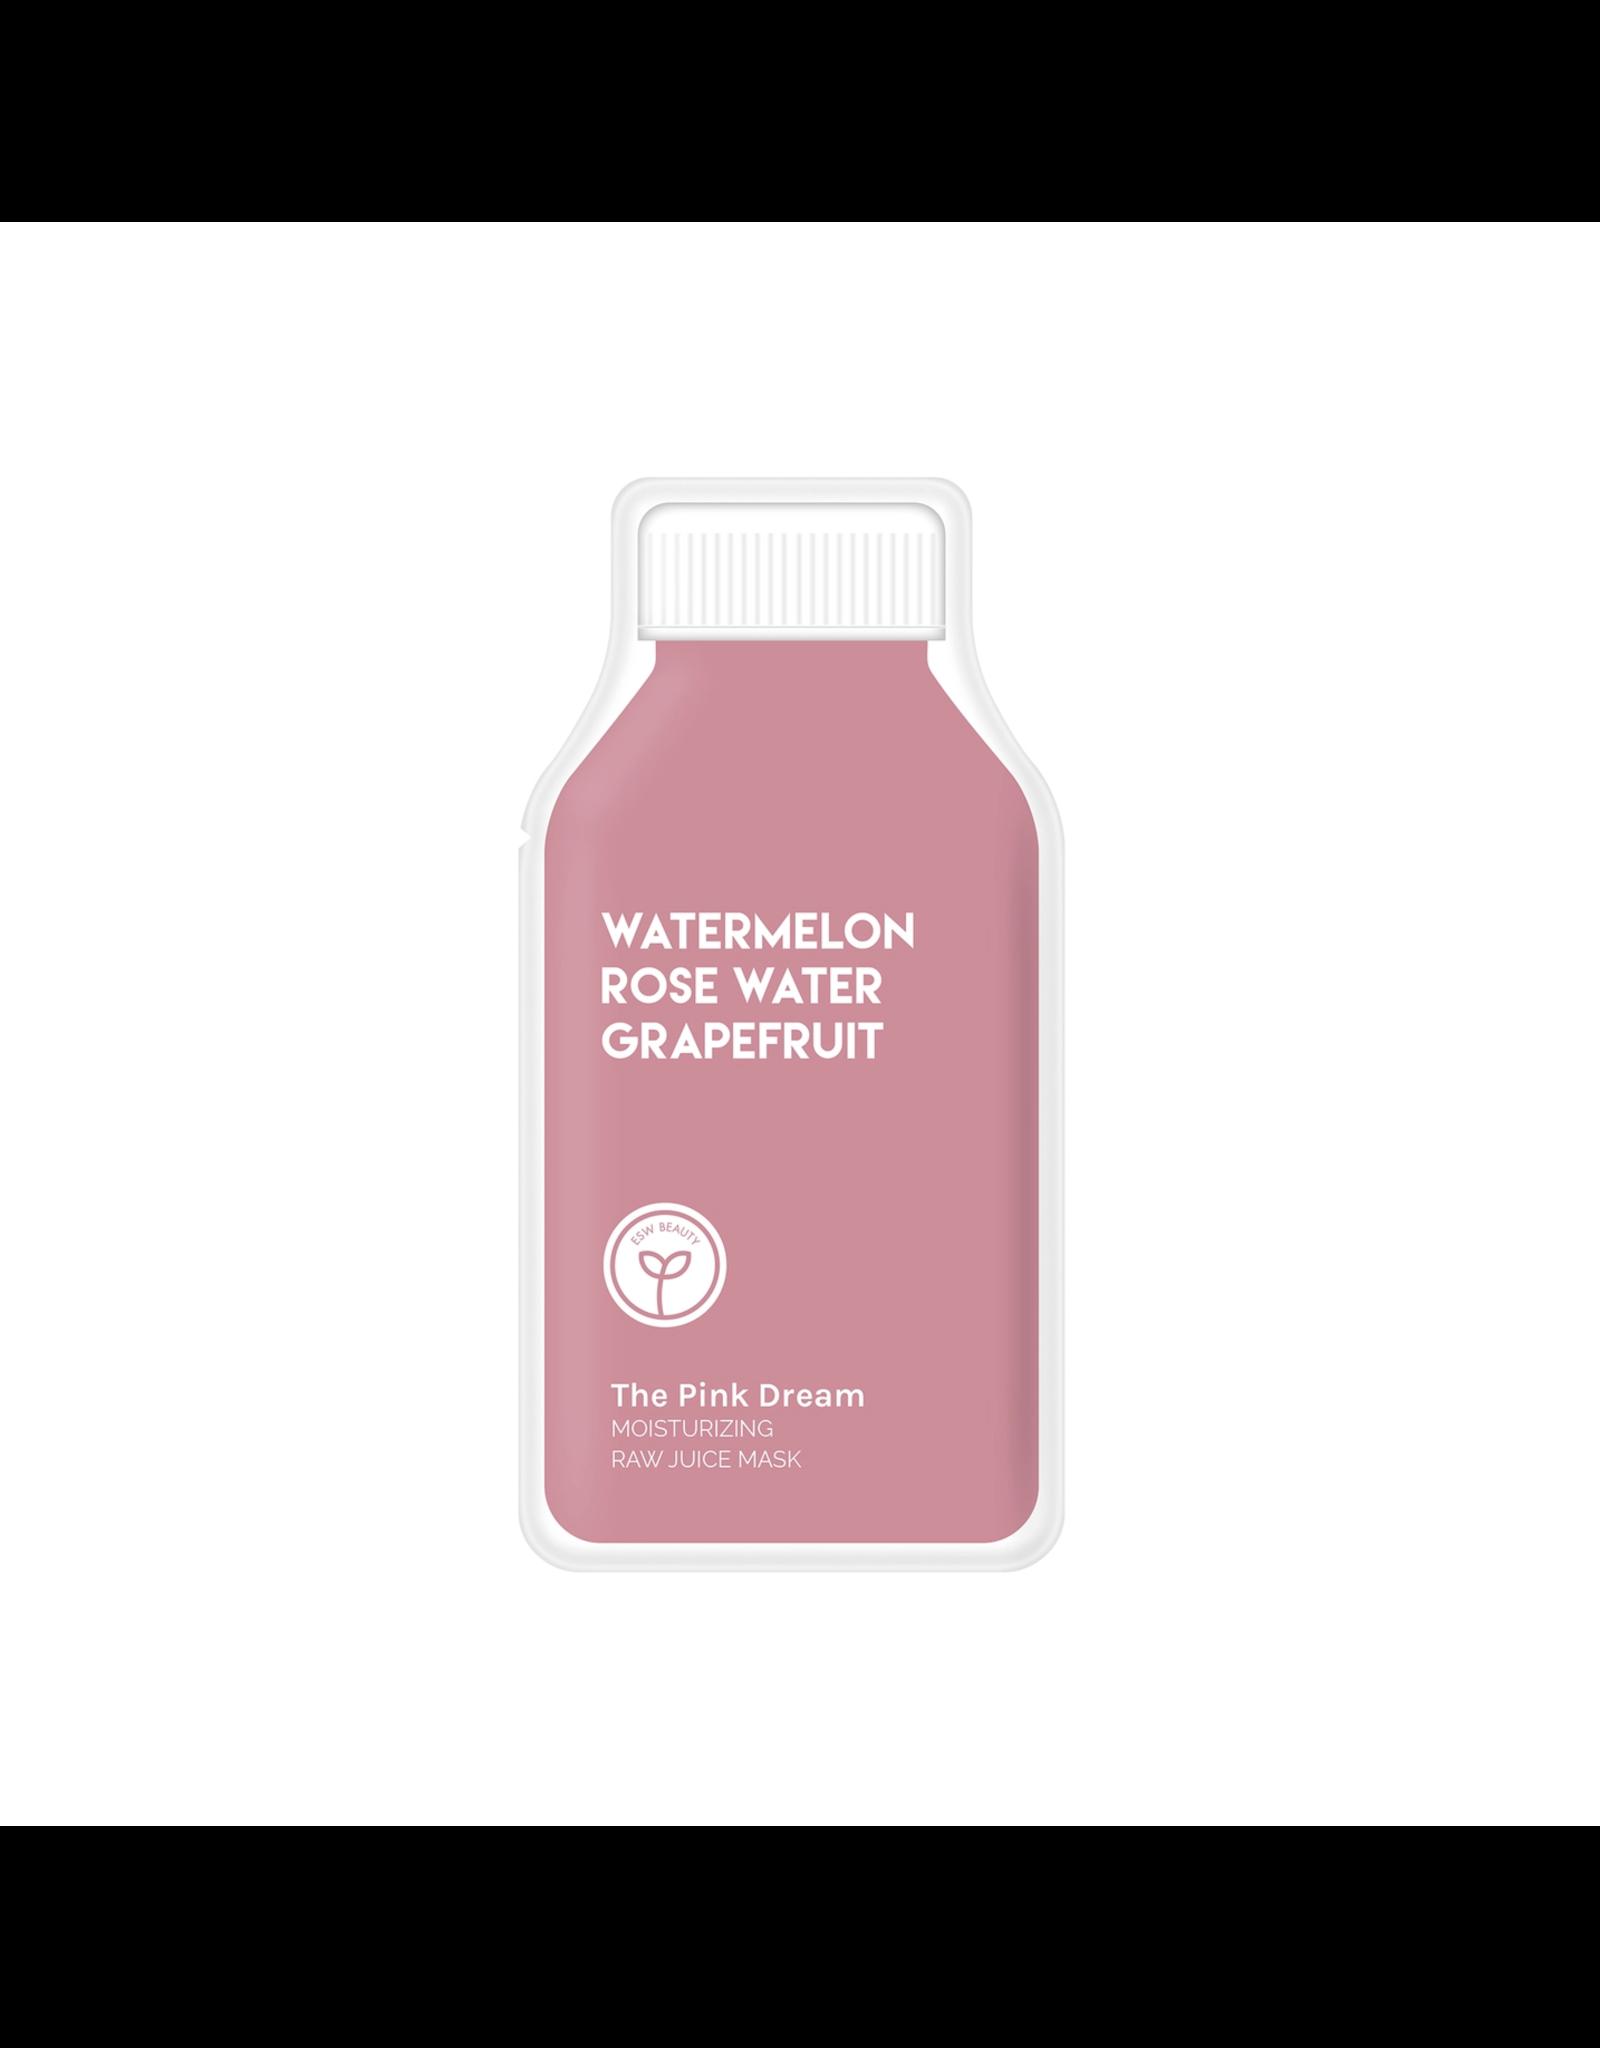 ESW Beauty The Pink Dream Moisturizing Raw Juice Mask